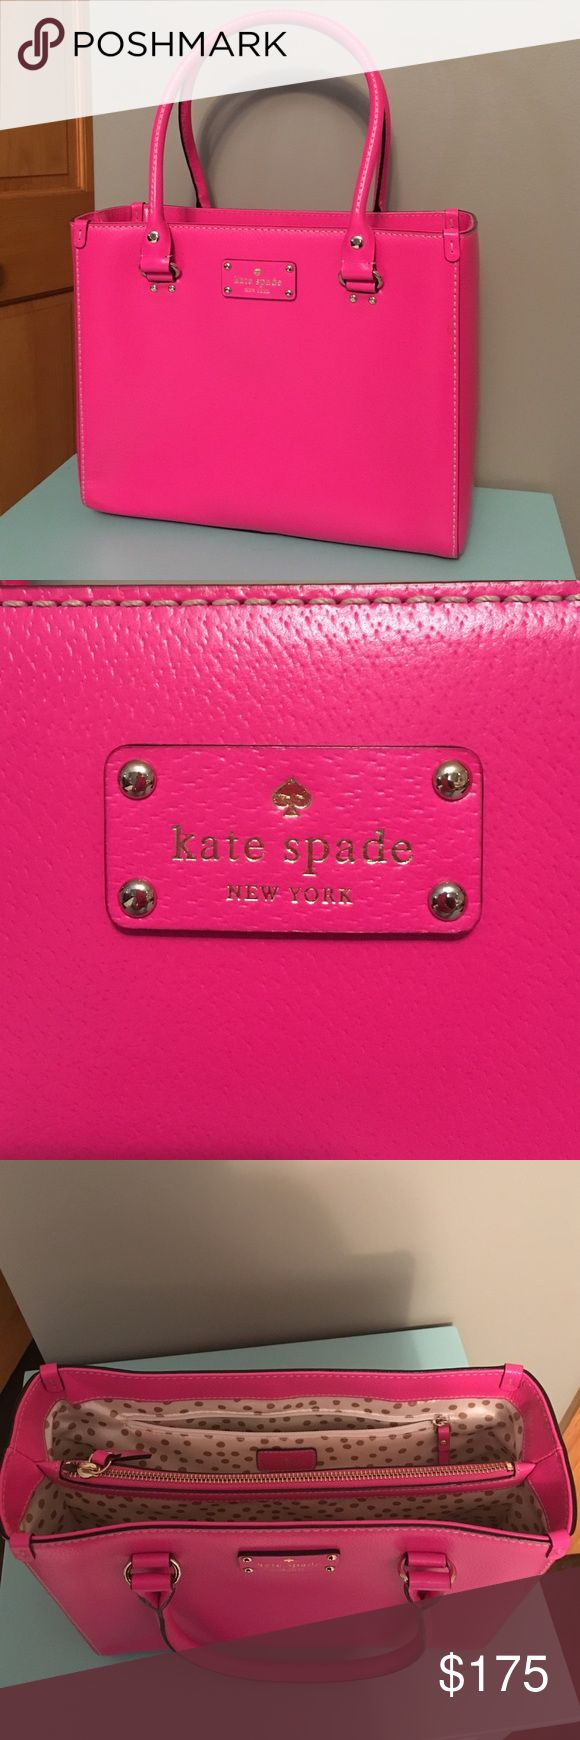 "FINAL SALE PRICE Kate Spade Wellesley Purse Perfect condition Kate Spade Wellesley Purse.  Measures 11.5"" W x 9.5"" H x 4.5"" D. kate spade Bags"